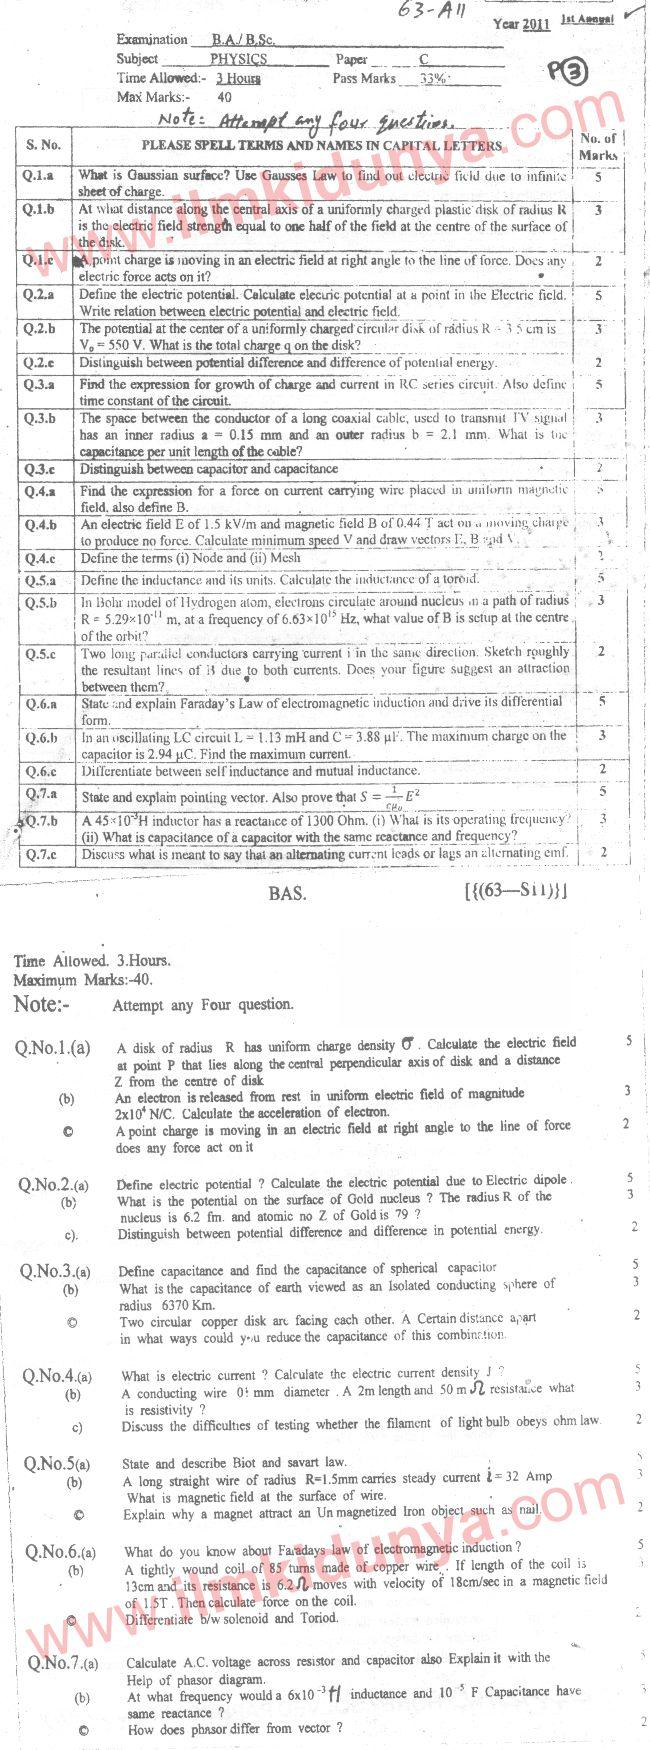 Past Papers 2011 Bahauddin Zakariya University BA Physics